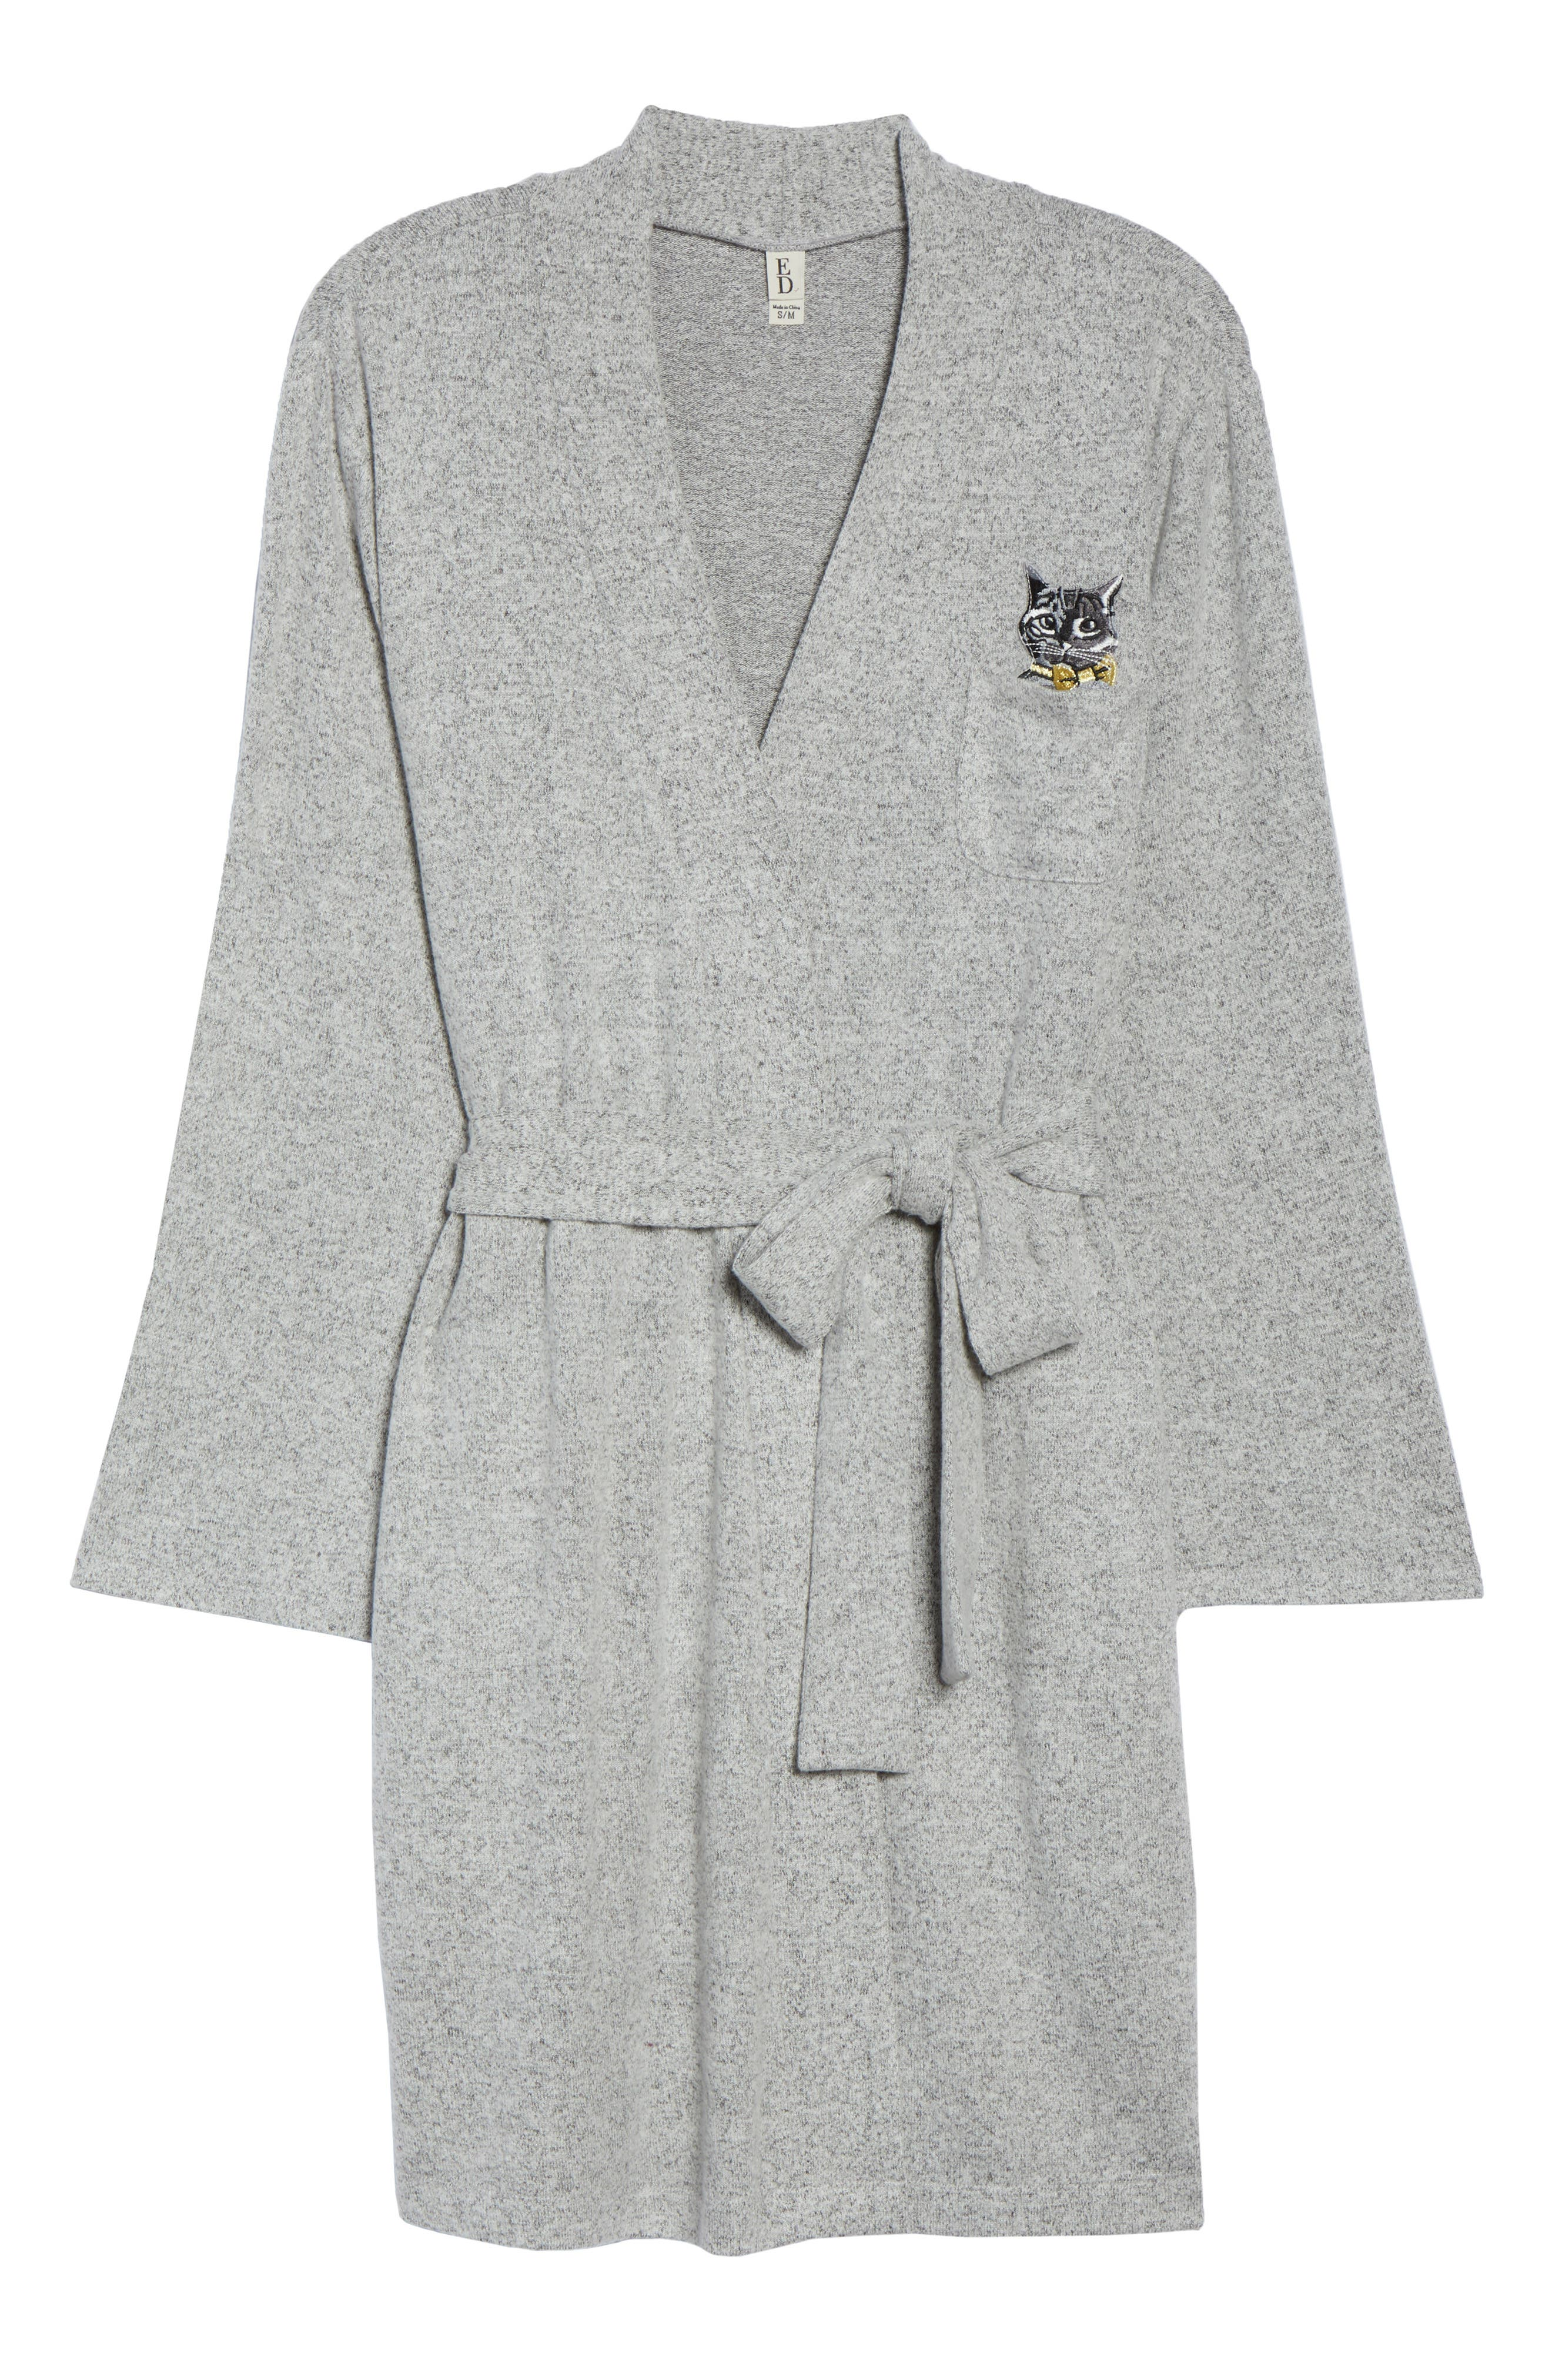 Cat Short Robe,                             Alternate thumbnail 6, color,                             HEATHER GREY